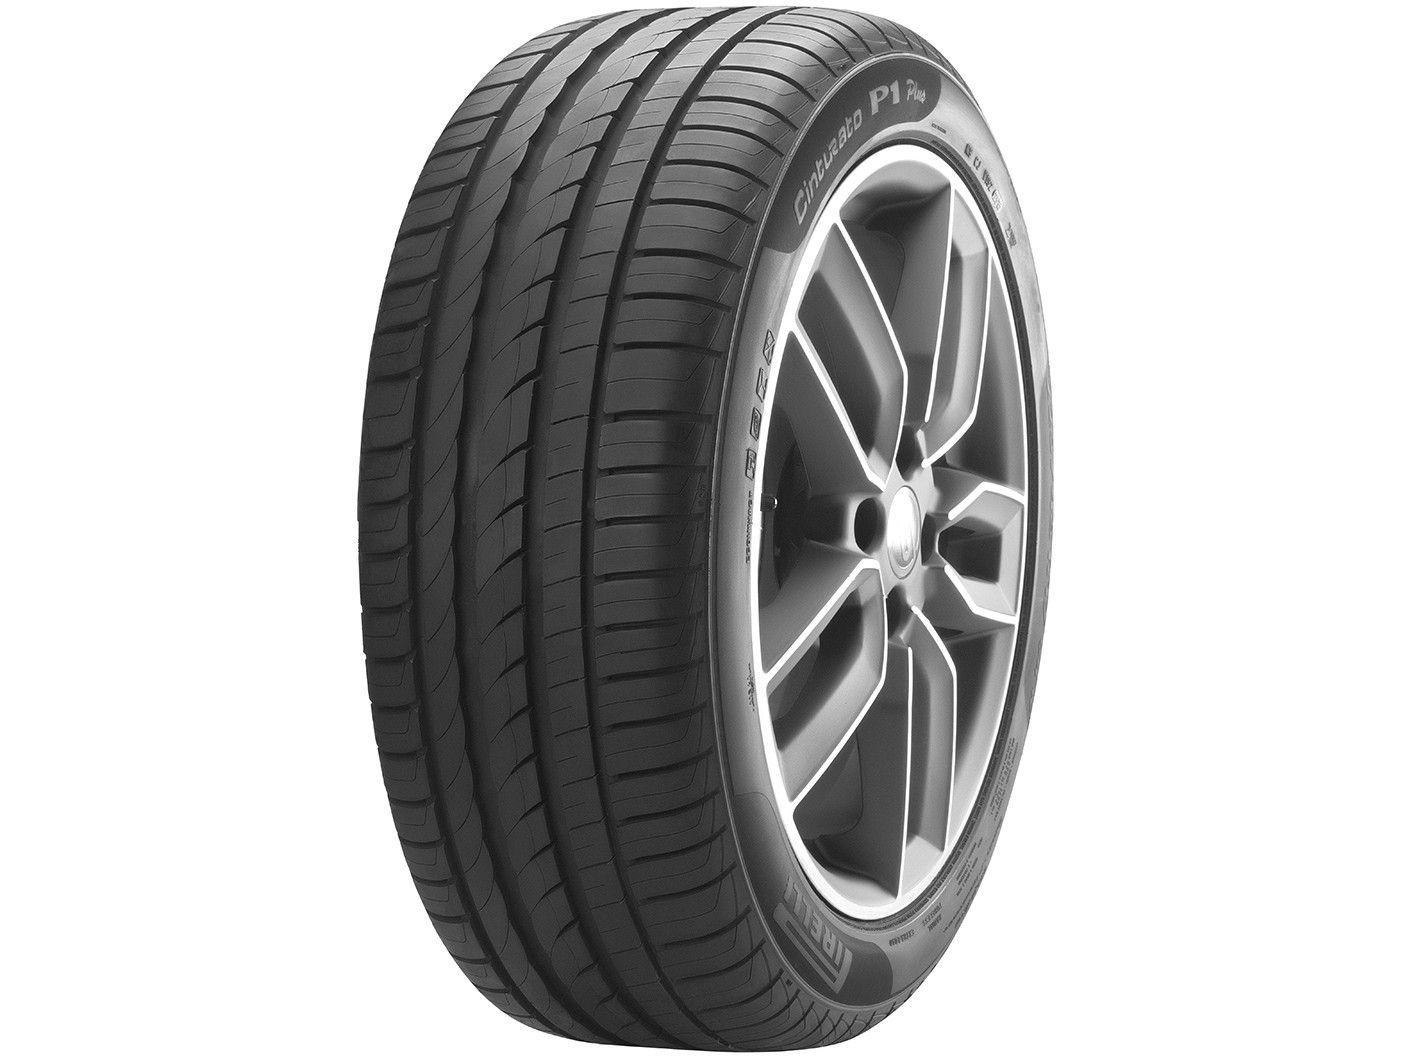 "Pneu Aro 17"" Pirelli - 225/50R17 98V XL P1 Cinturato +"